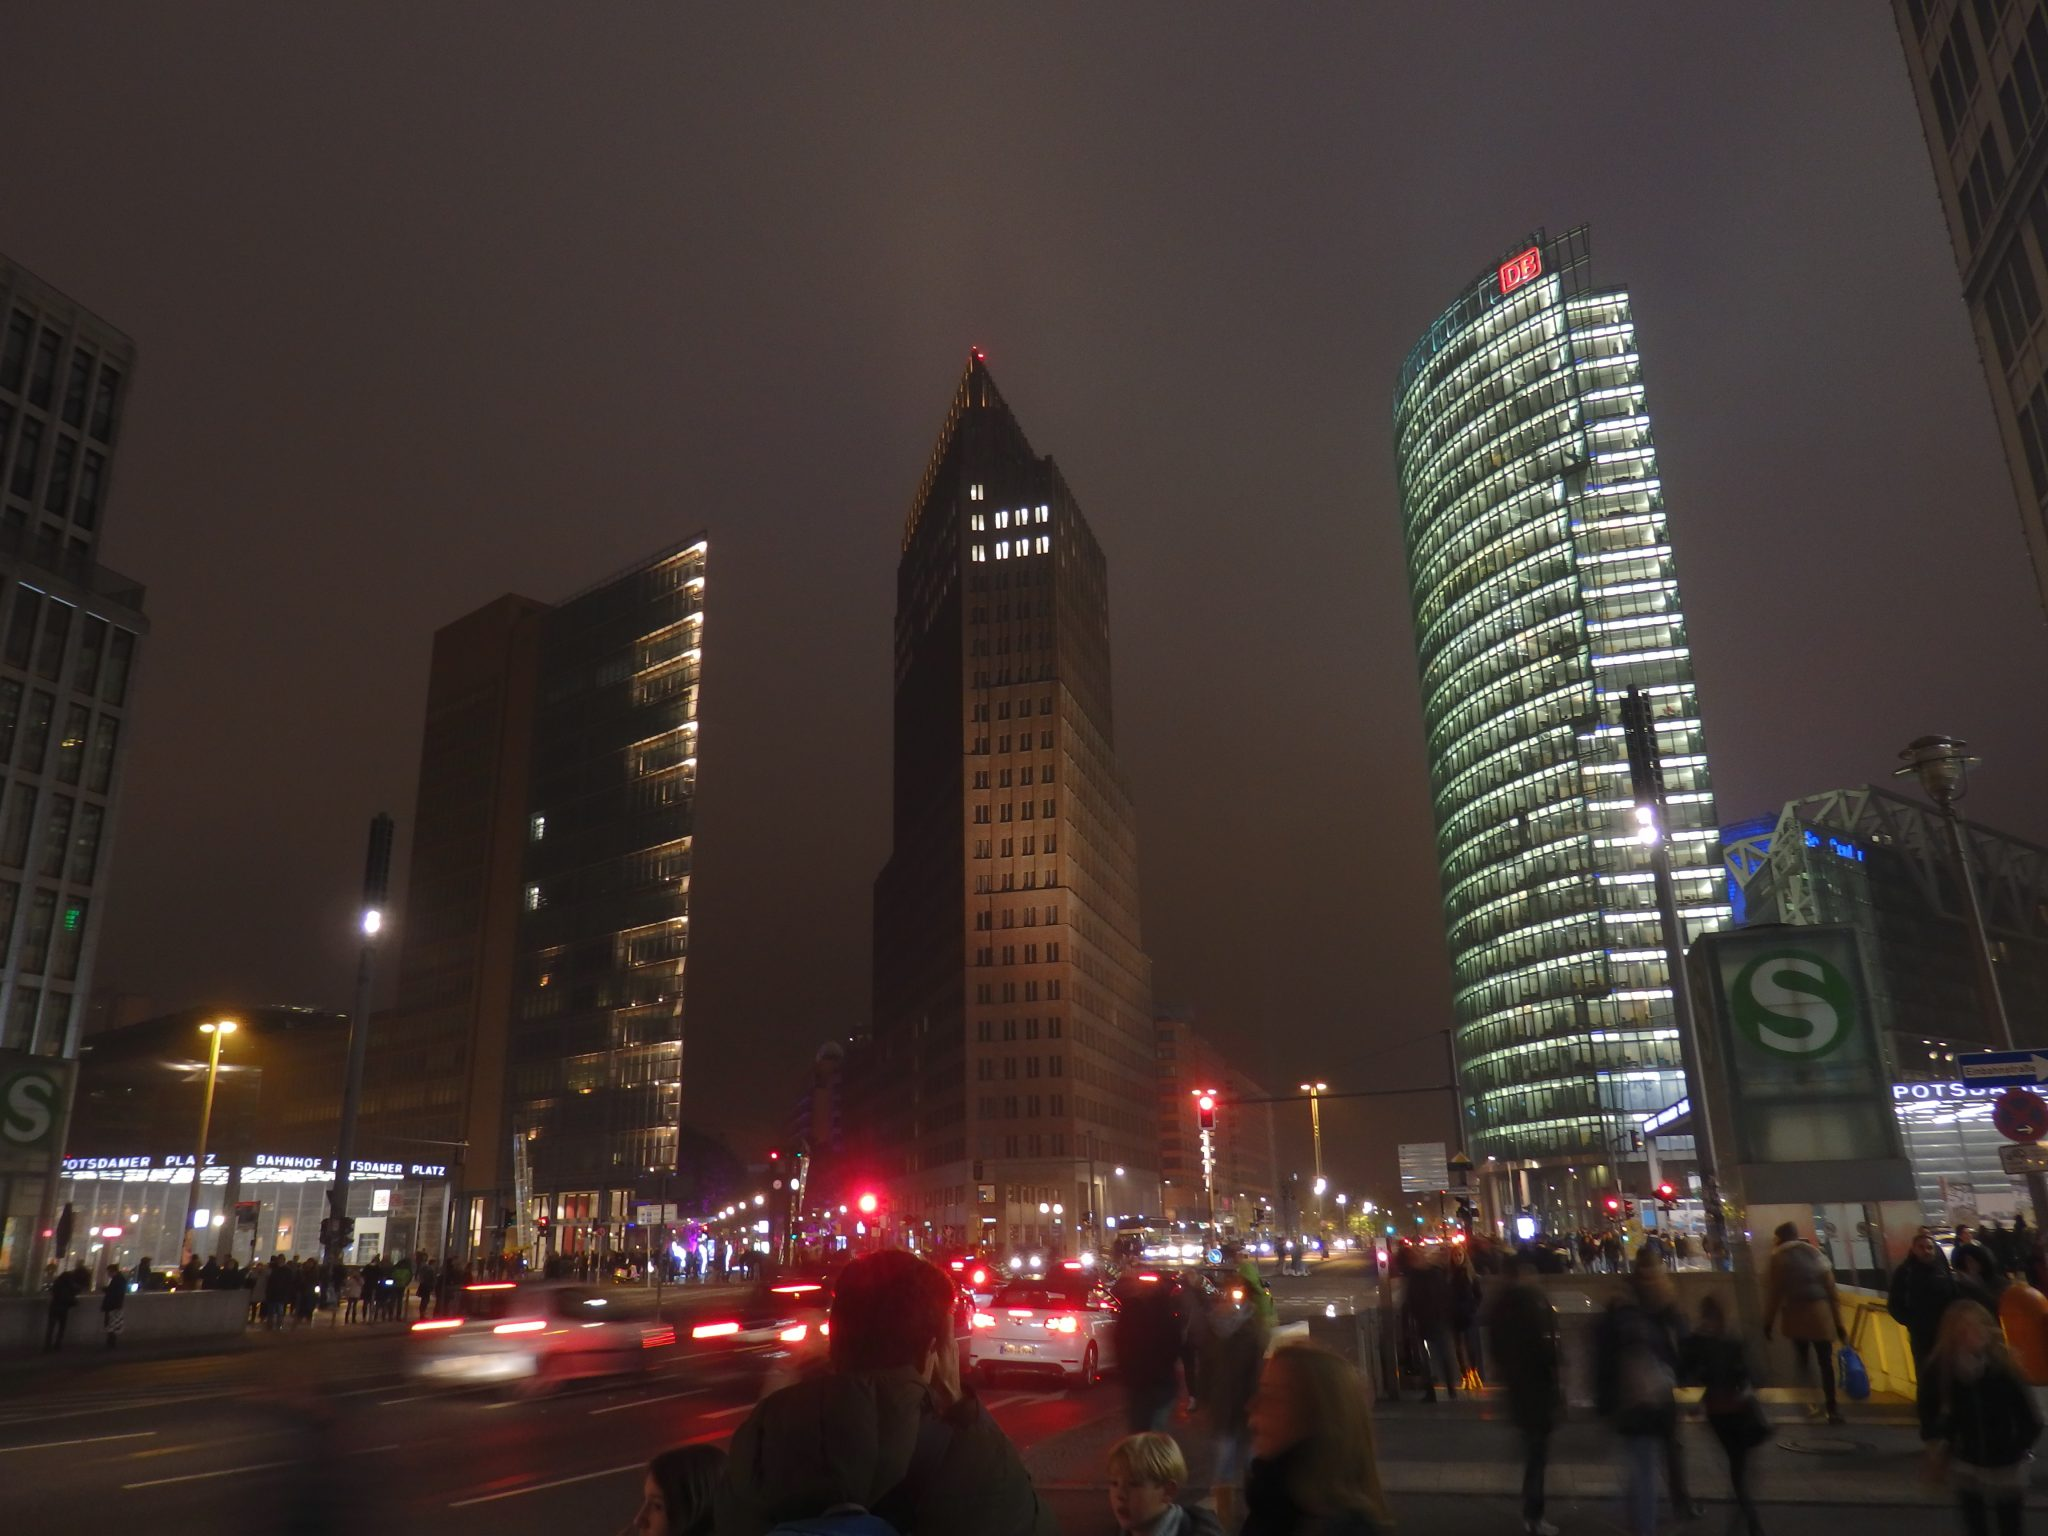 A view of Potsdamer Platz at night